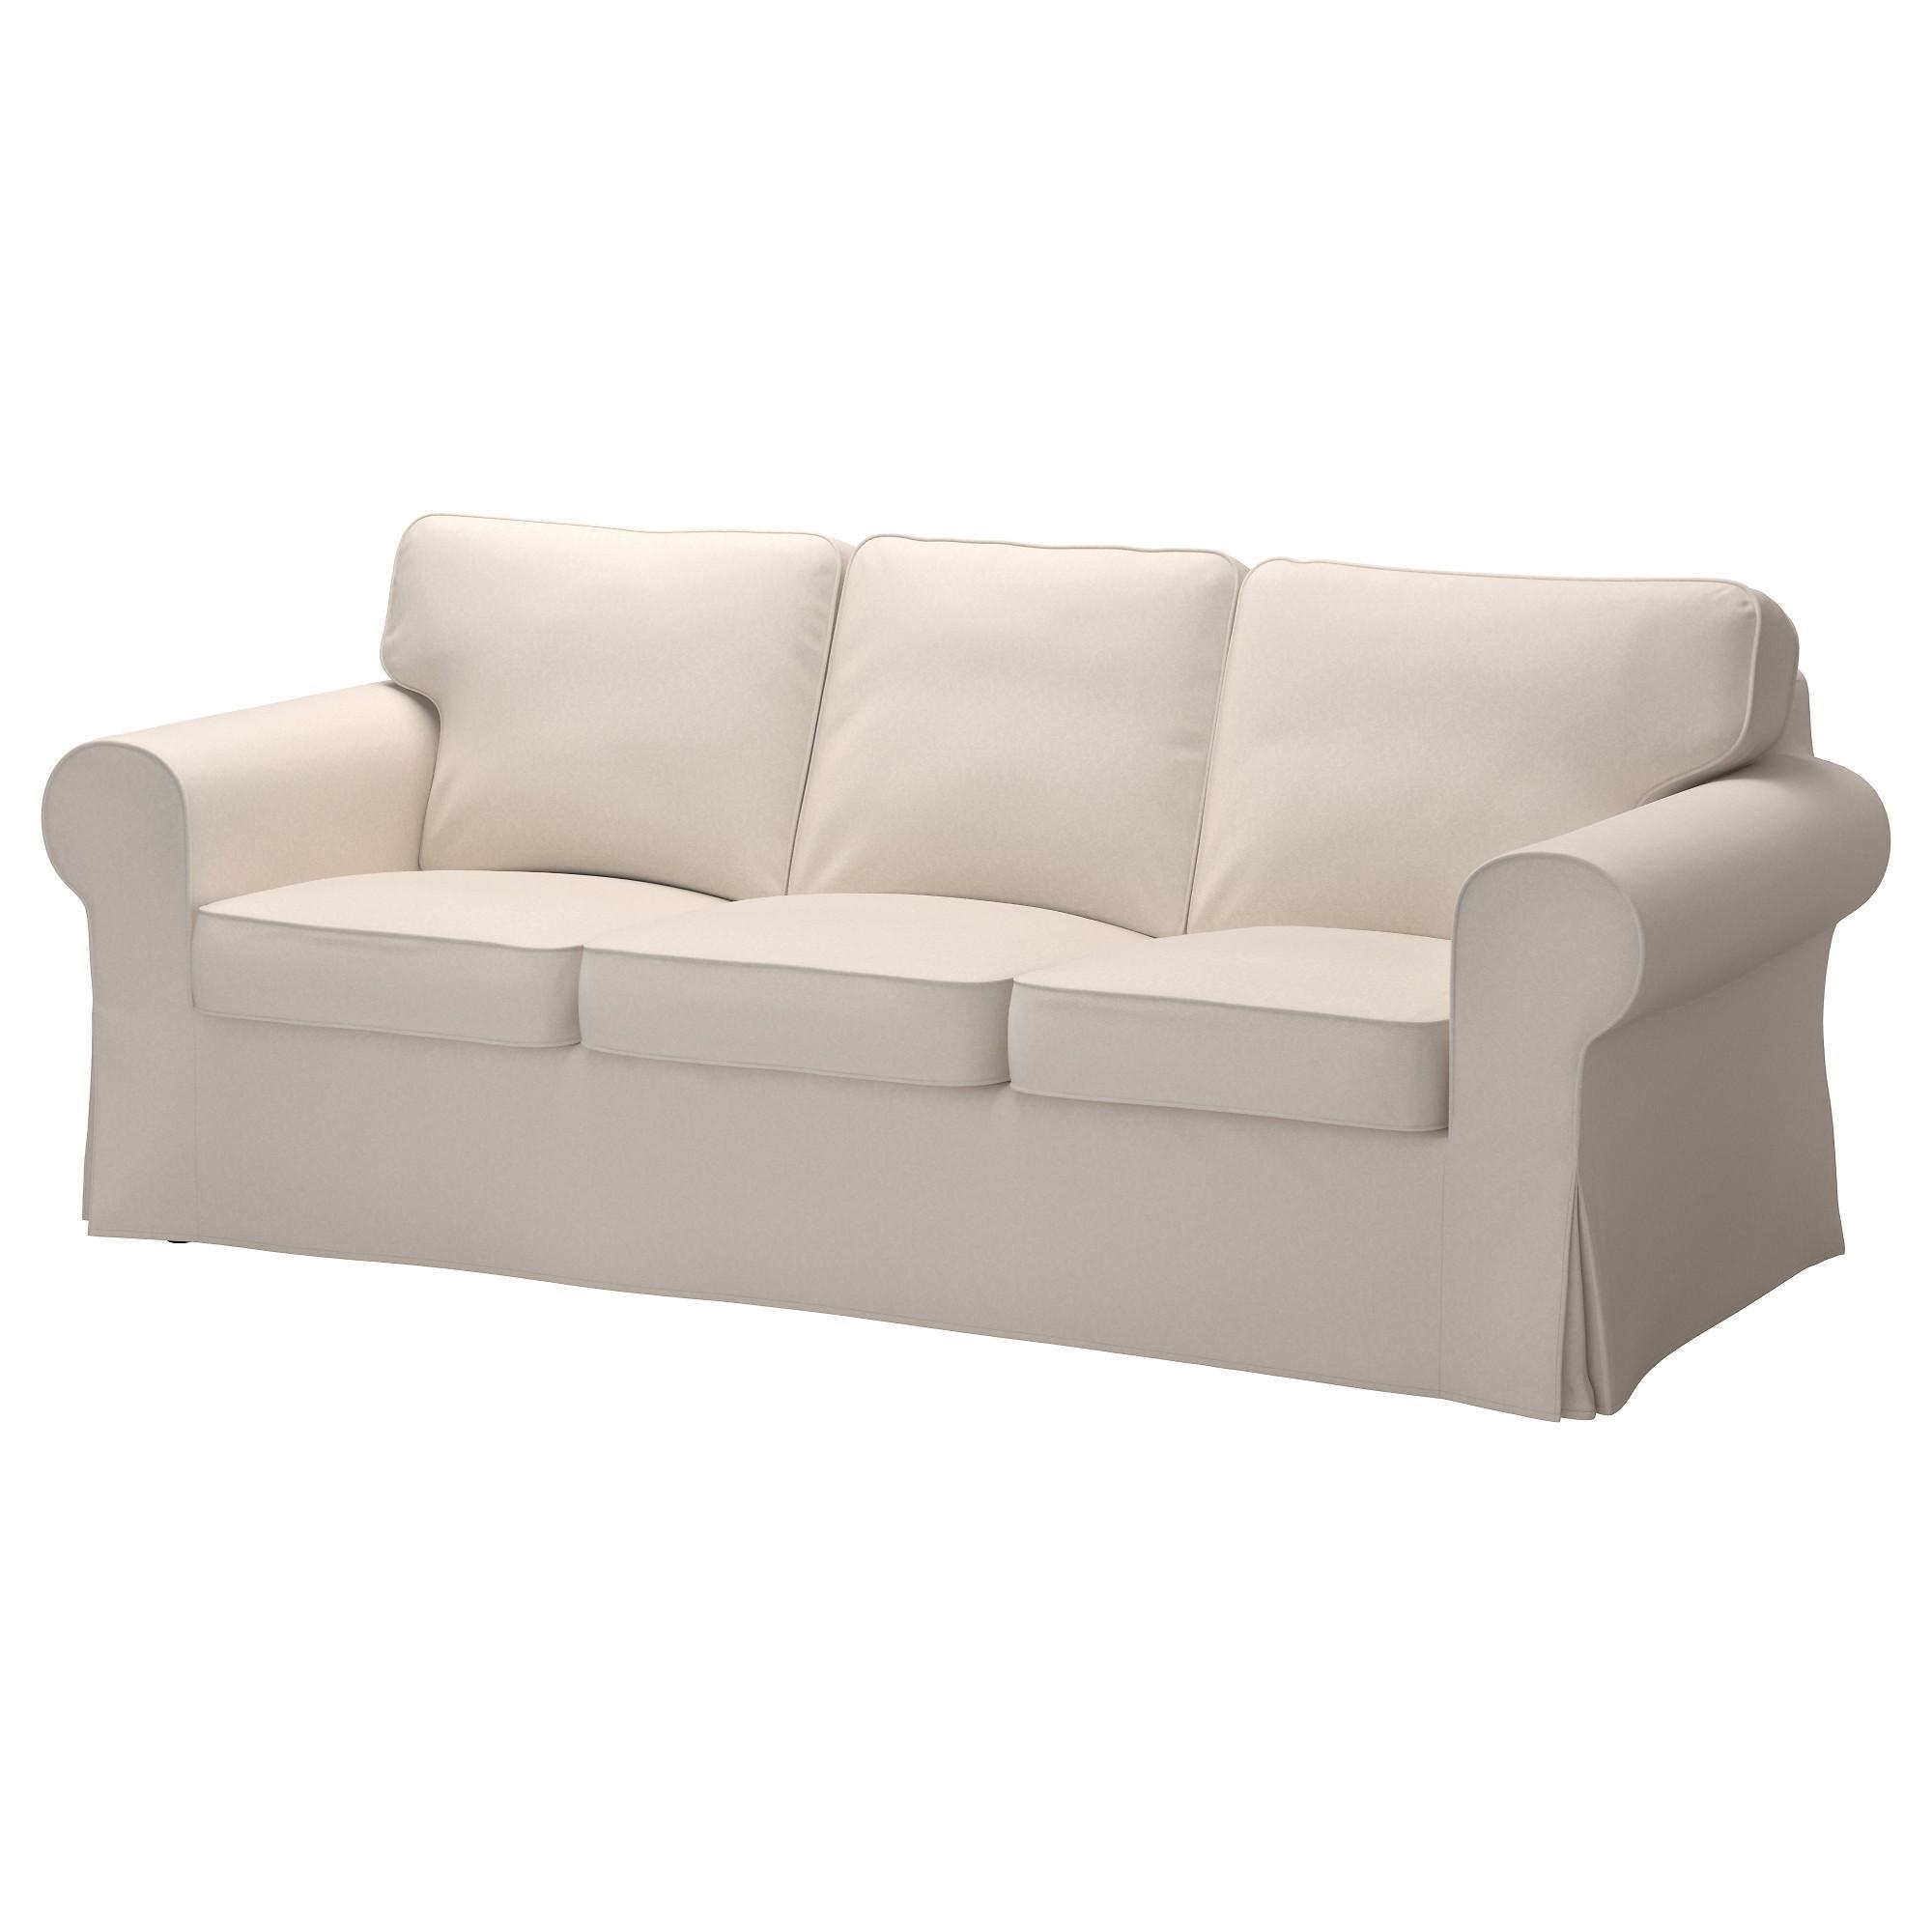 sofa cover fabric online new york city sofas 20 best ideas armless slipcovers